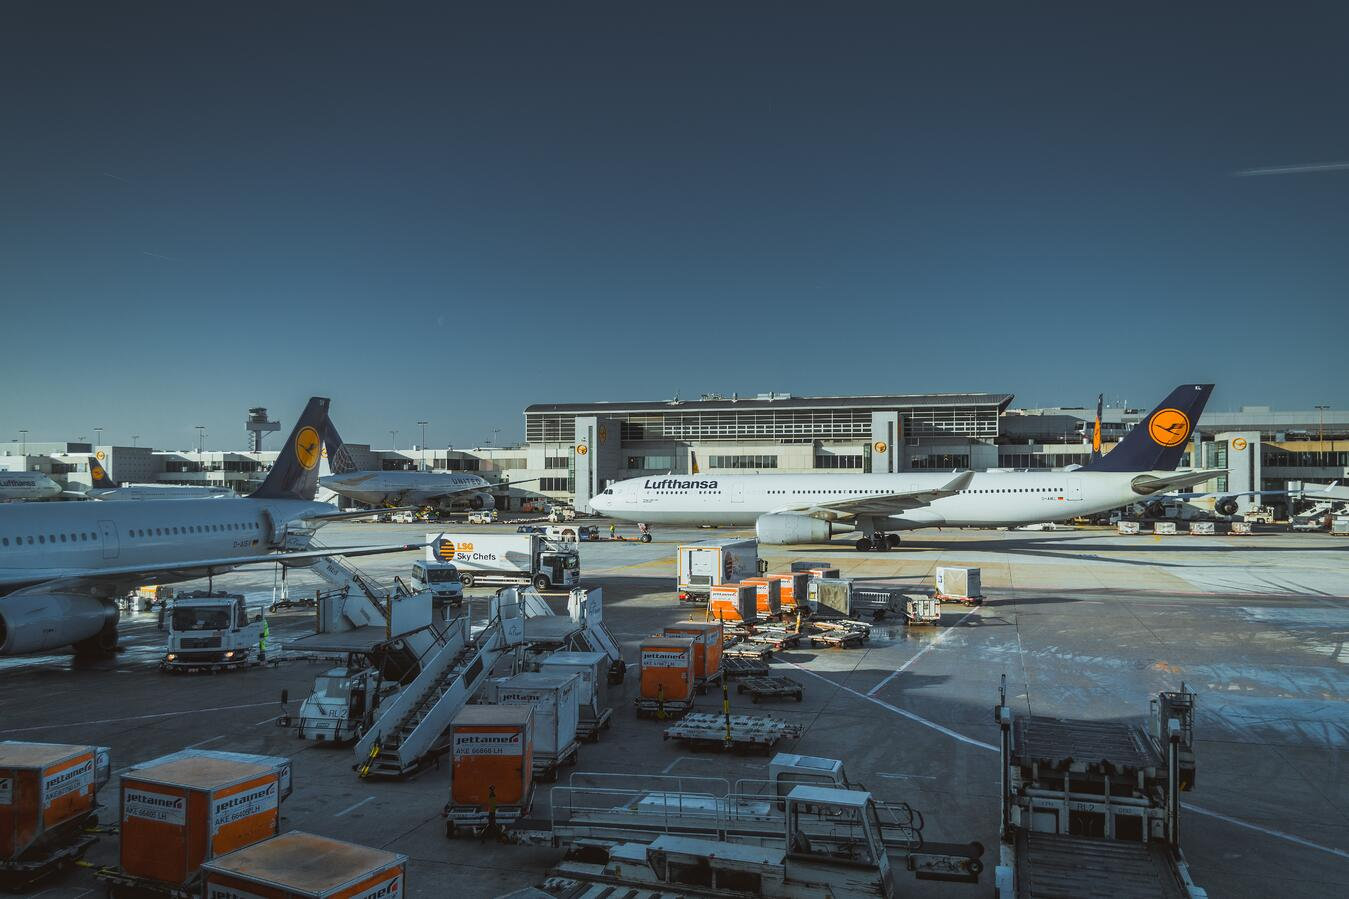 IMAGE 3_ '3 ways groundbreaking GSE technology is making airport maintenance'.jpg